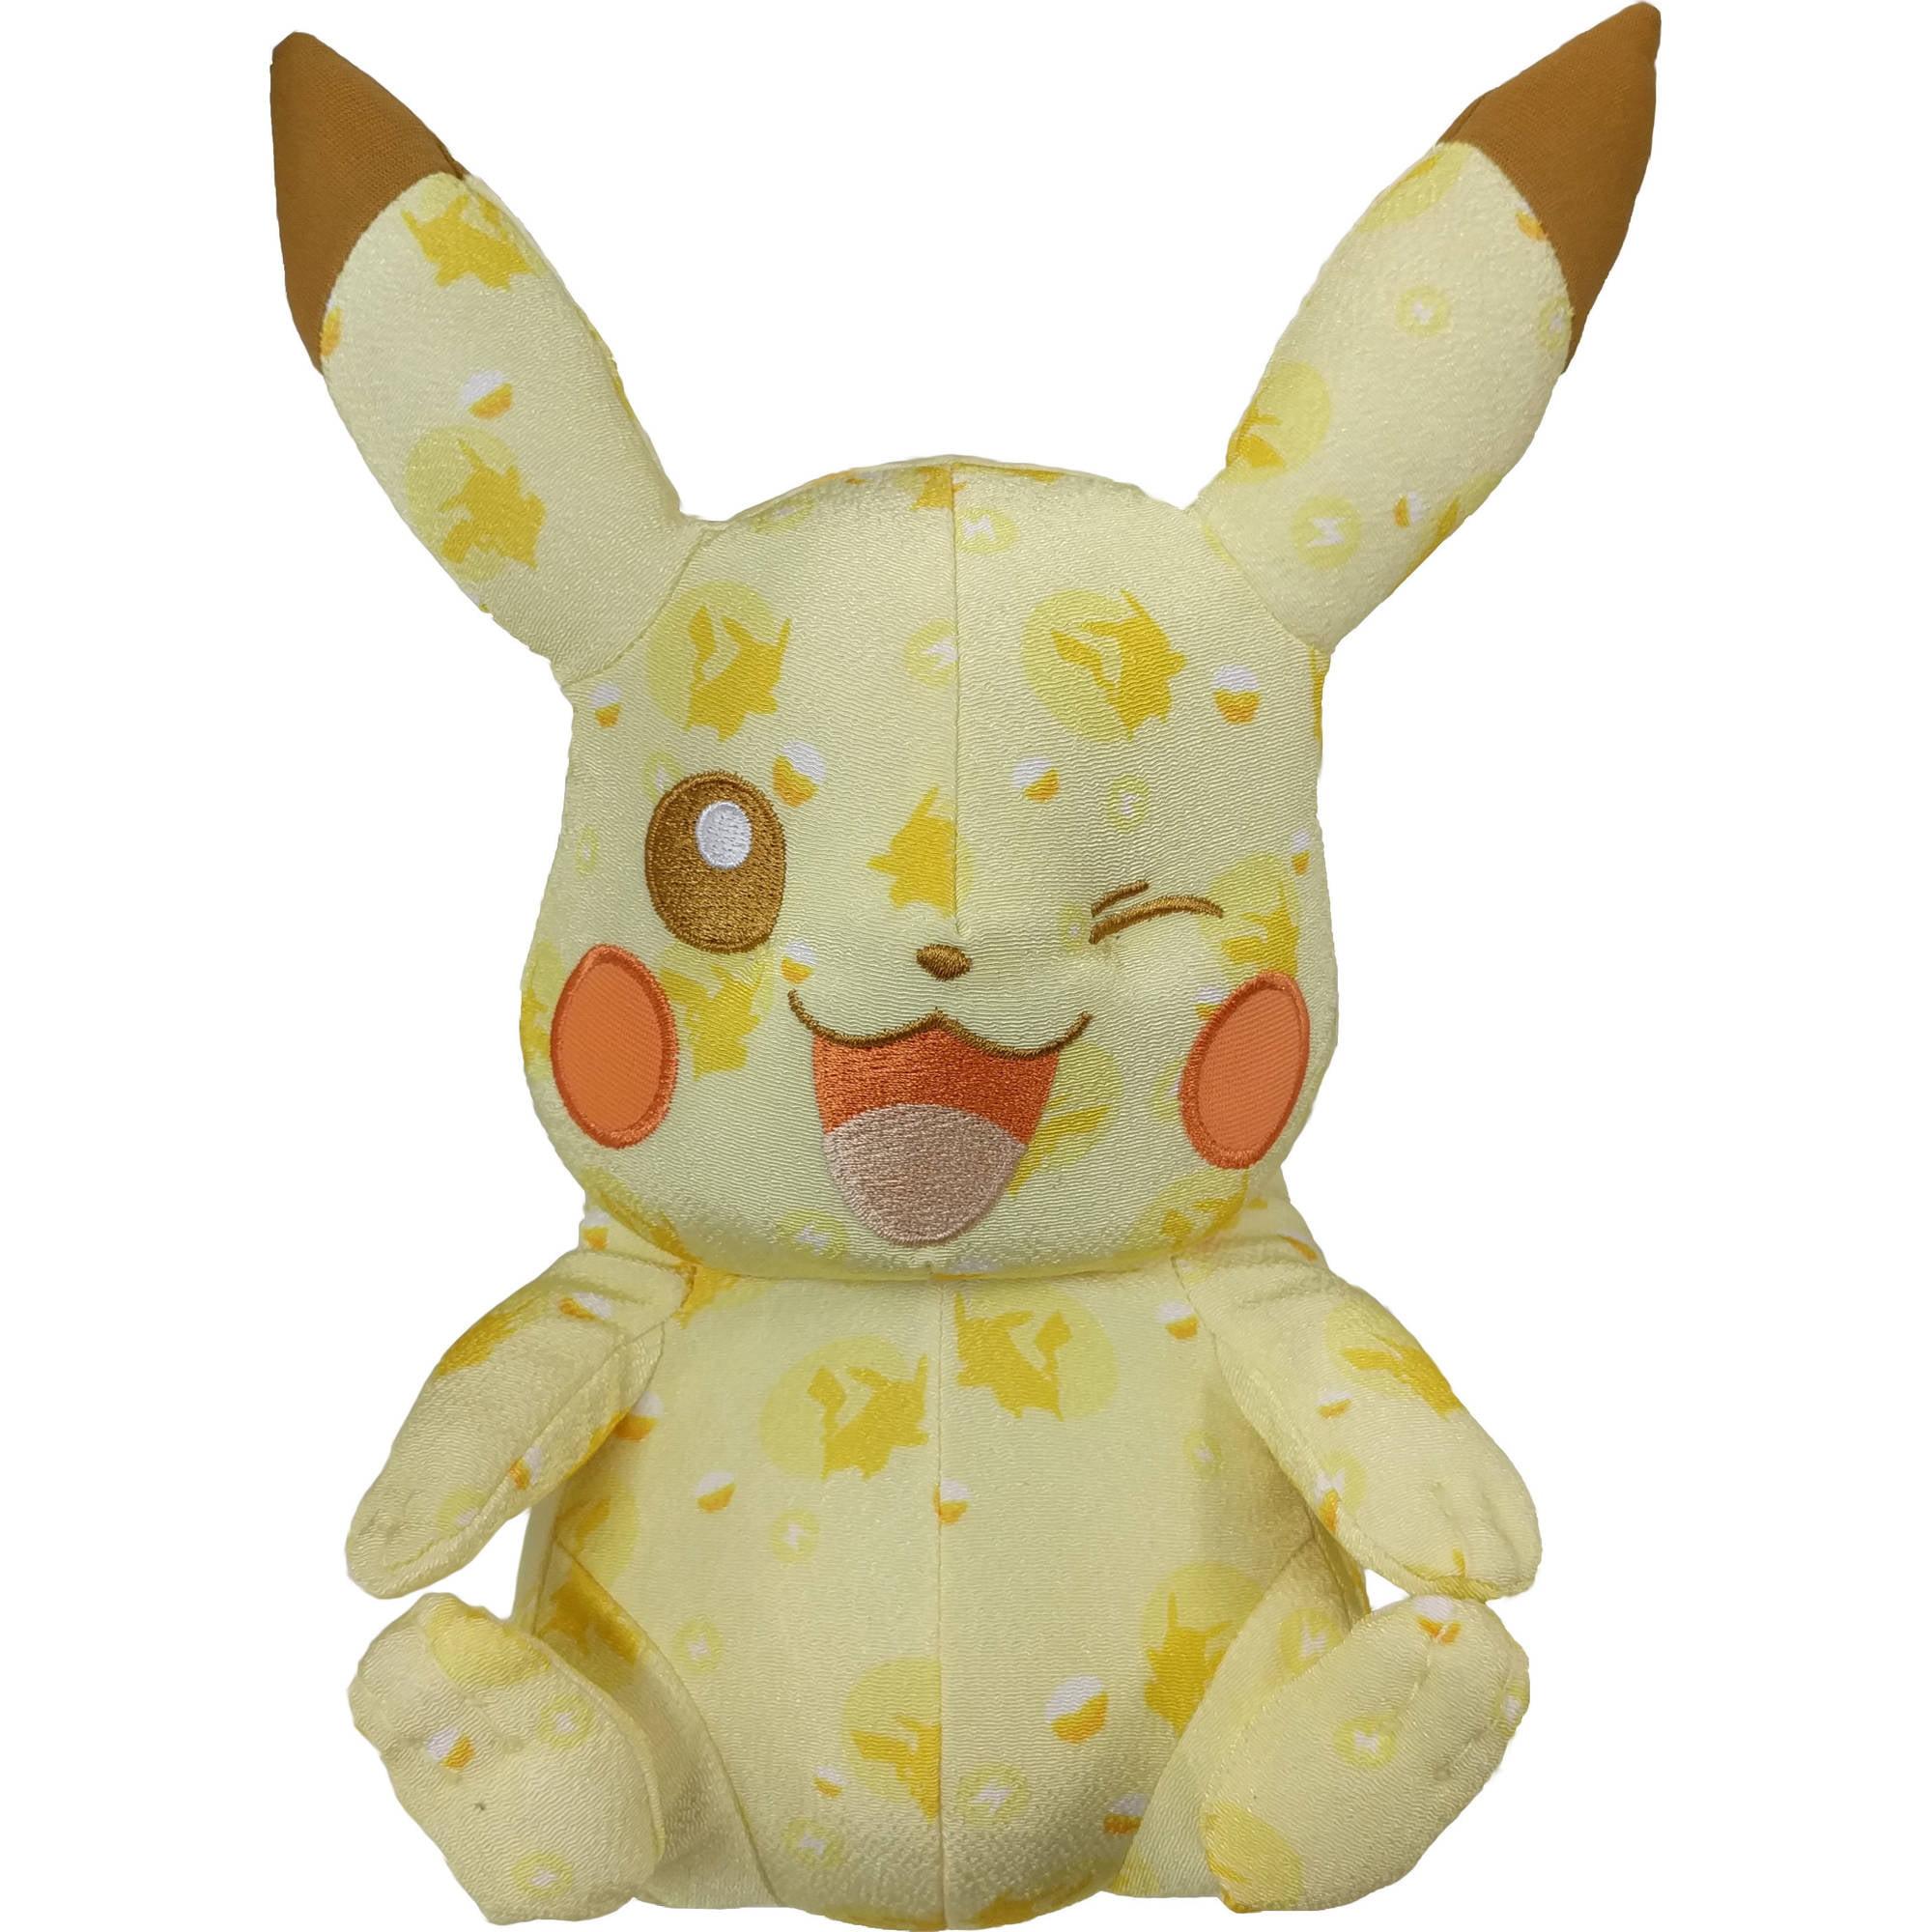 "Tomy Pokemon 20th Anniversary Pikachu 10"" Plush by TOMY"